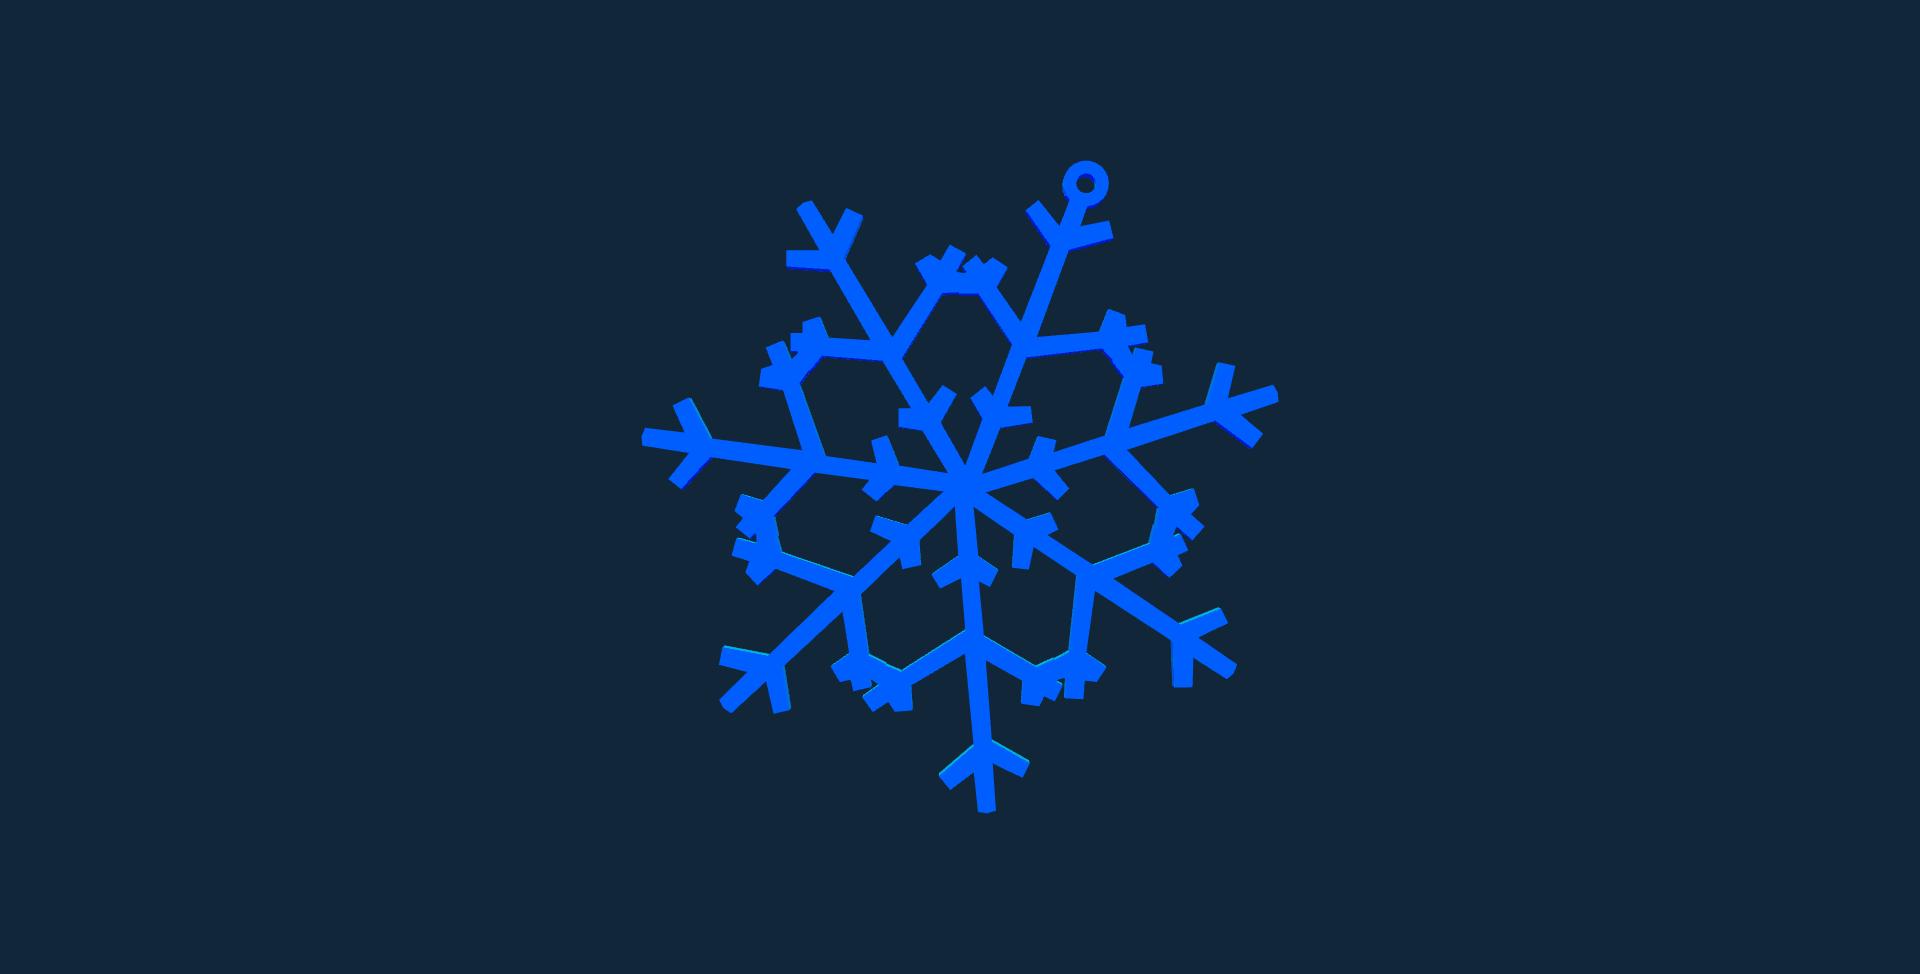 Snowflake design 1 stl file